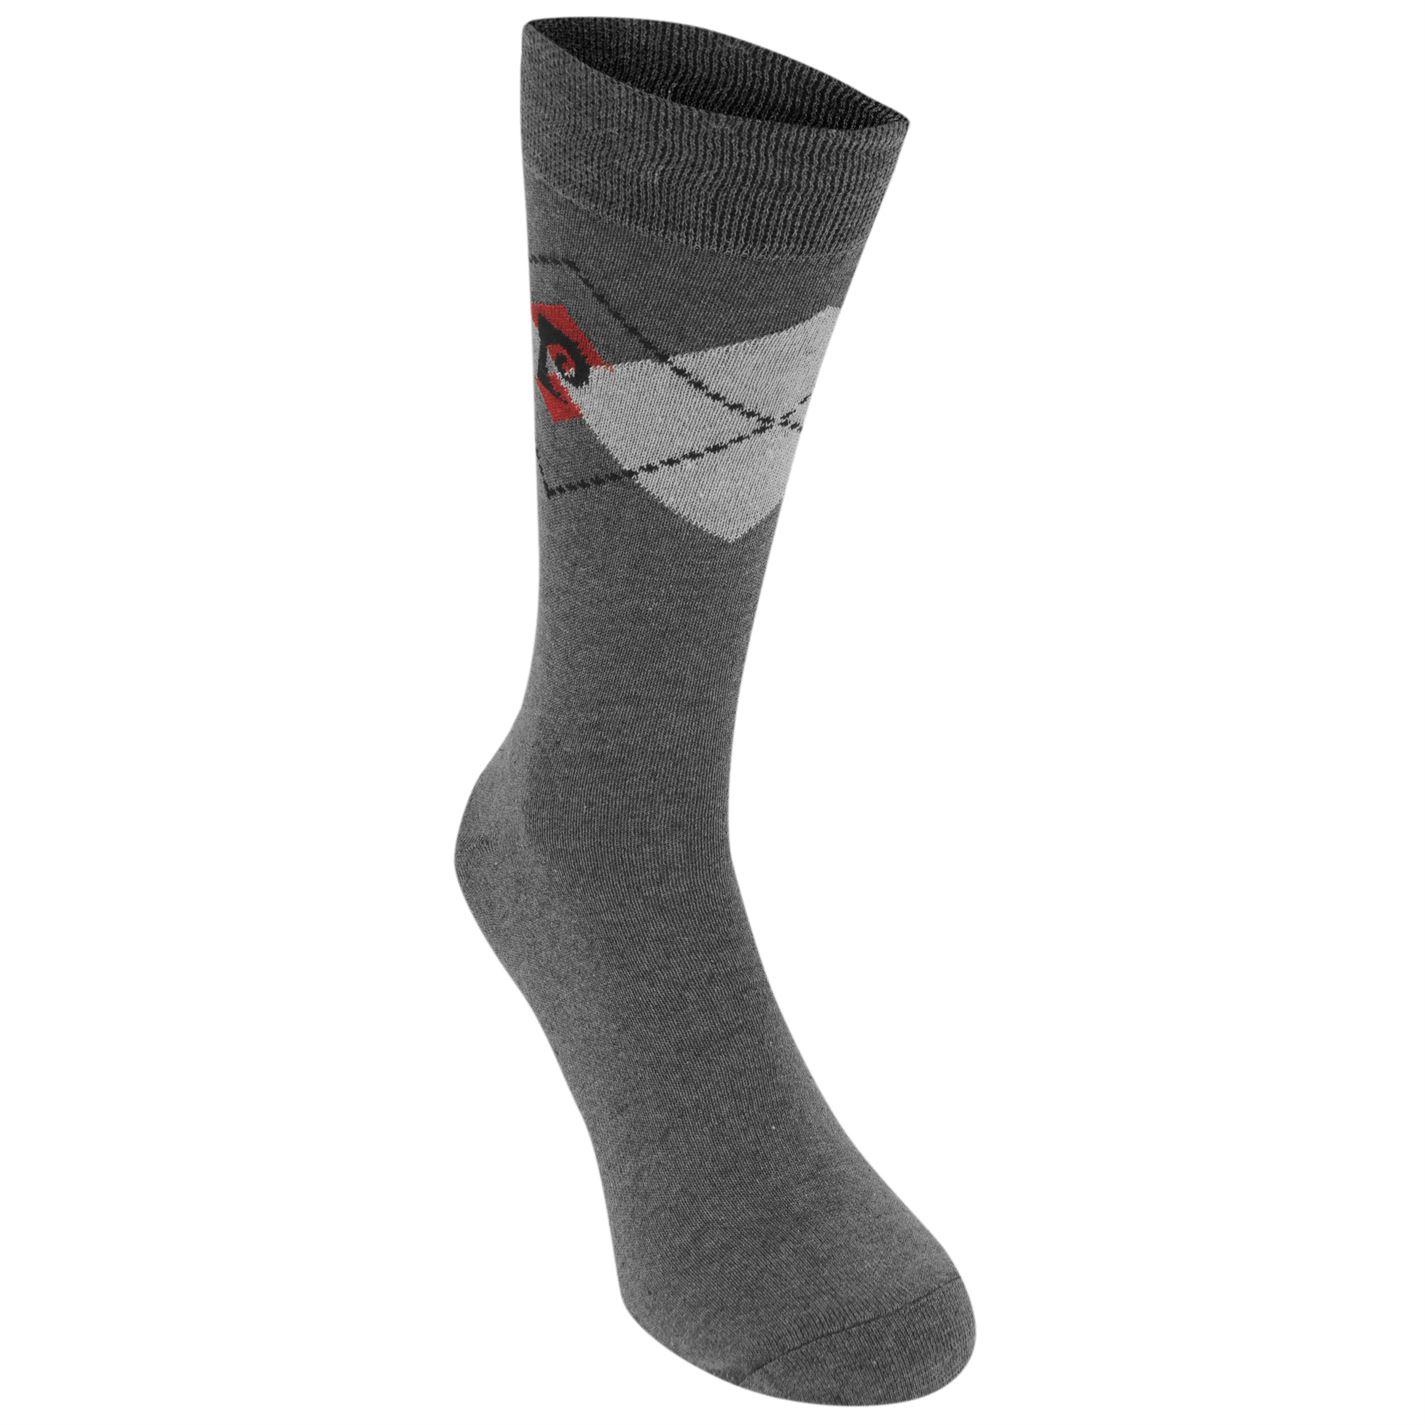 Pierre automobiledin 3 Pack Fashion Socks Mens Gents ras du cou Pulls